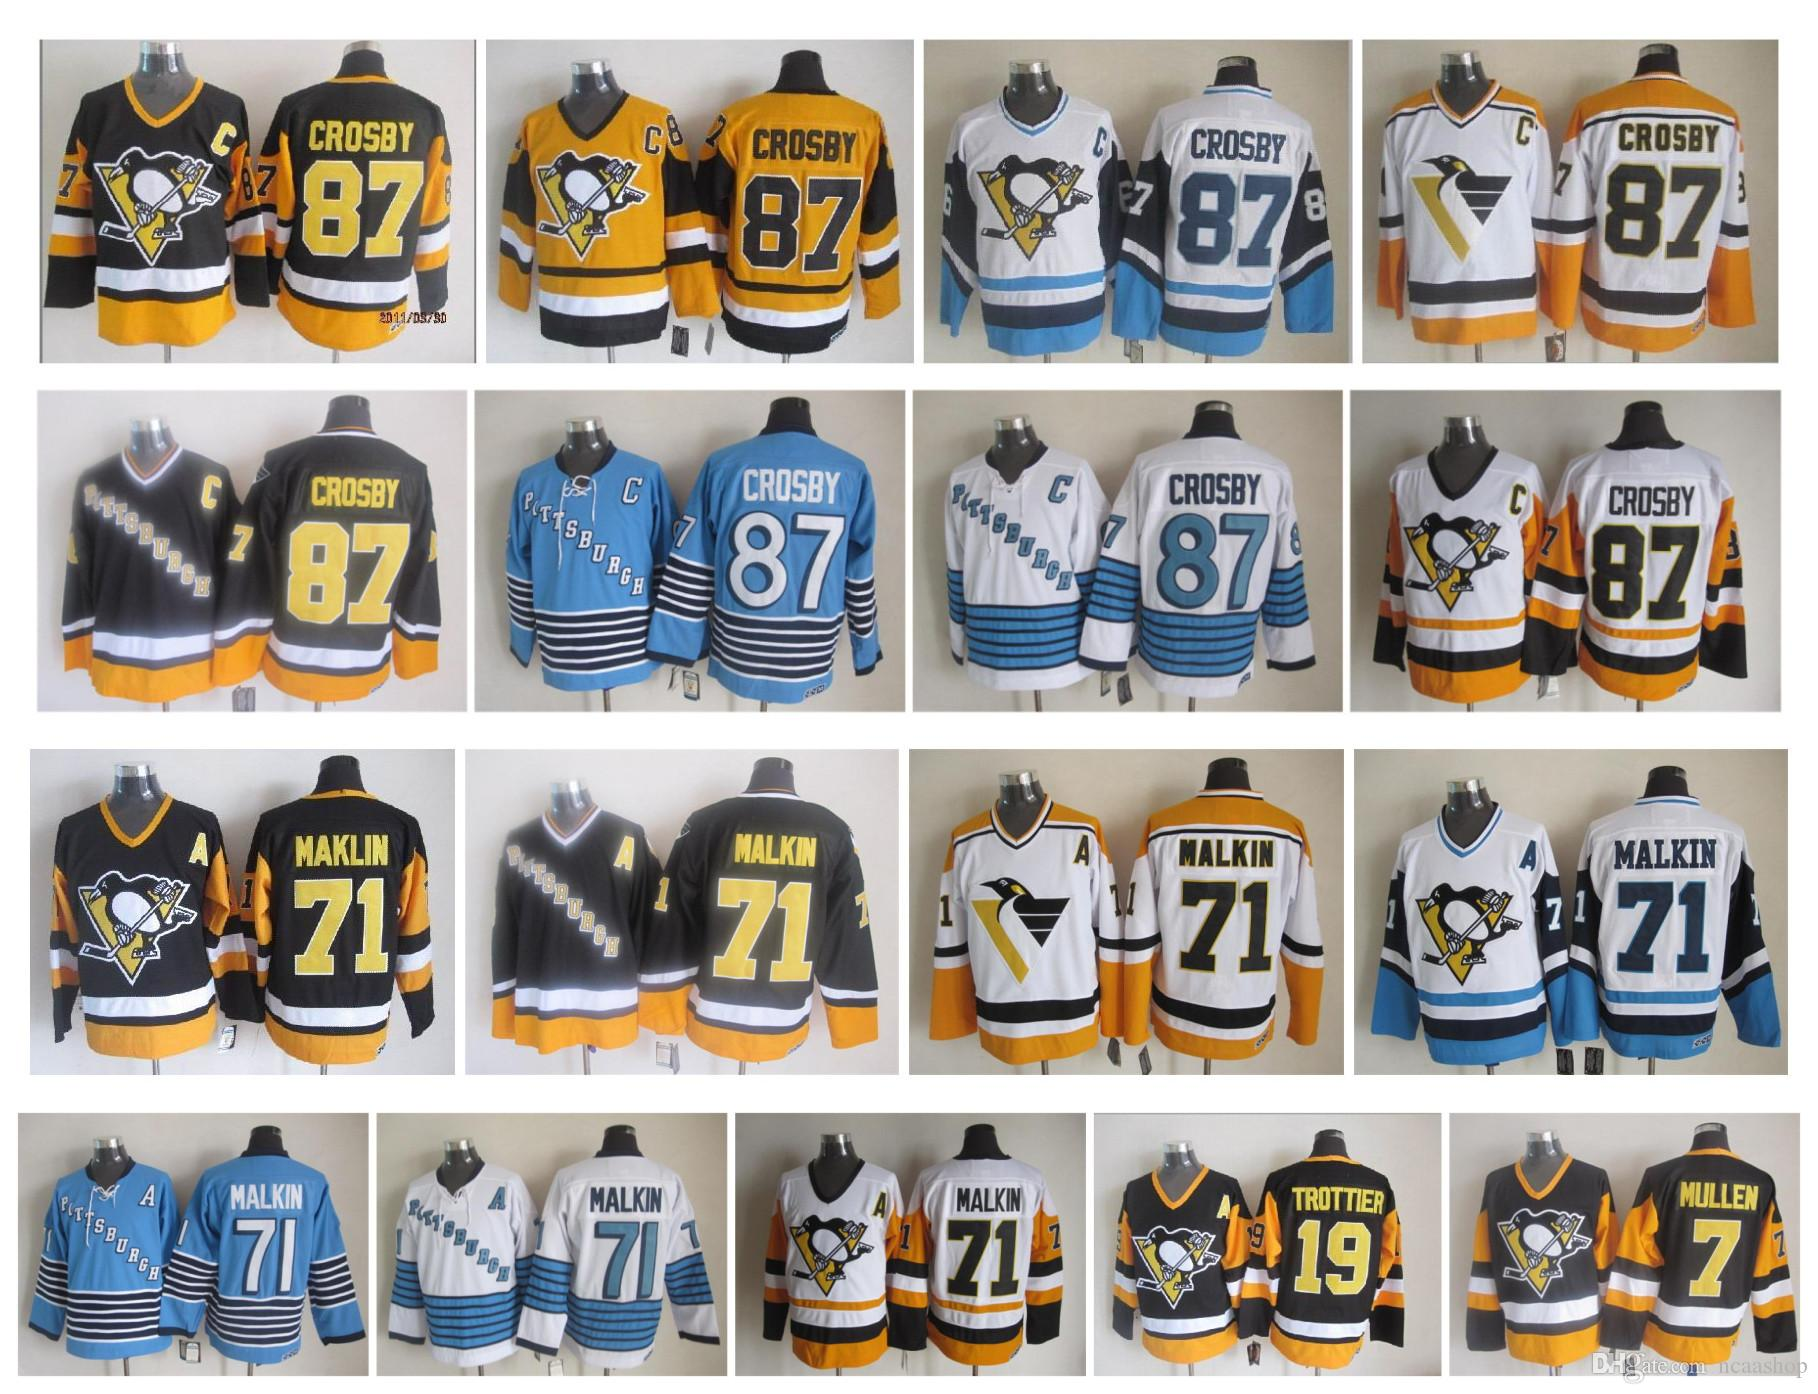 best service dcb53 be775 Retro Vintage NHL Pittsburgh Penguins Jersey 87 Sidney Crosby 71 Evgeni  Malkin 7 Joe Mullen 19 Bryan Trottier CCM Hockey Jersey Top Quality